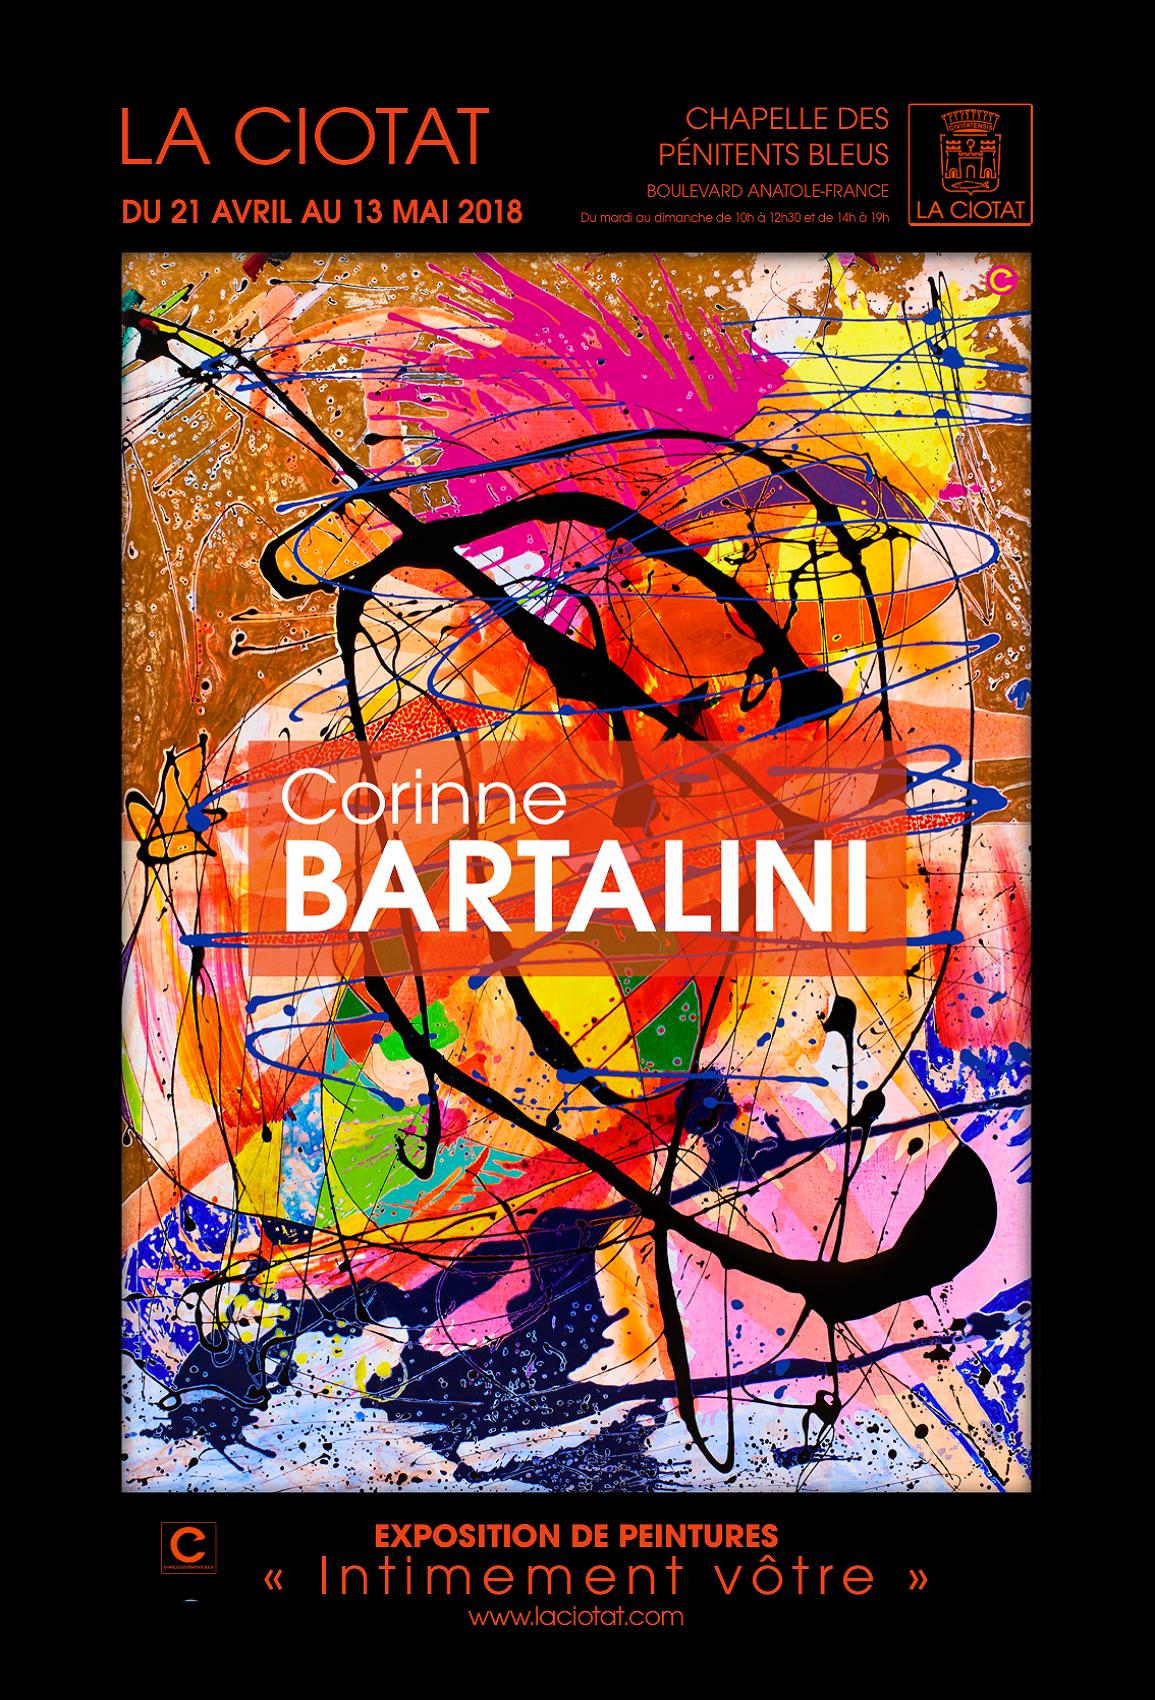 Affiche Exposition Bartalini 2 2018